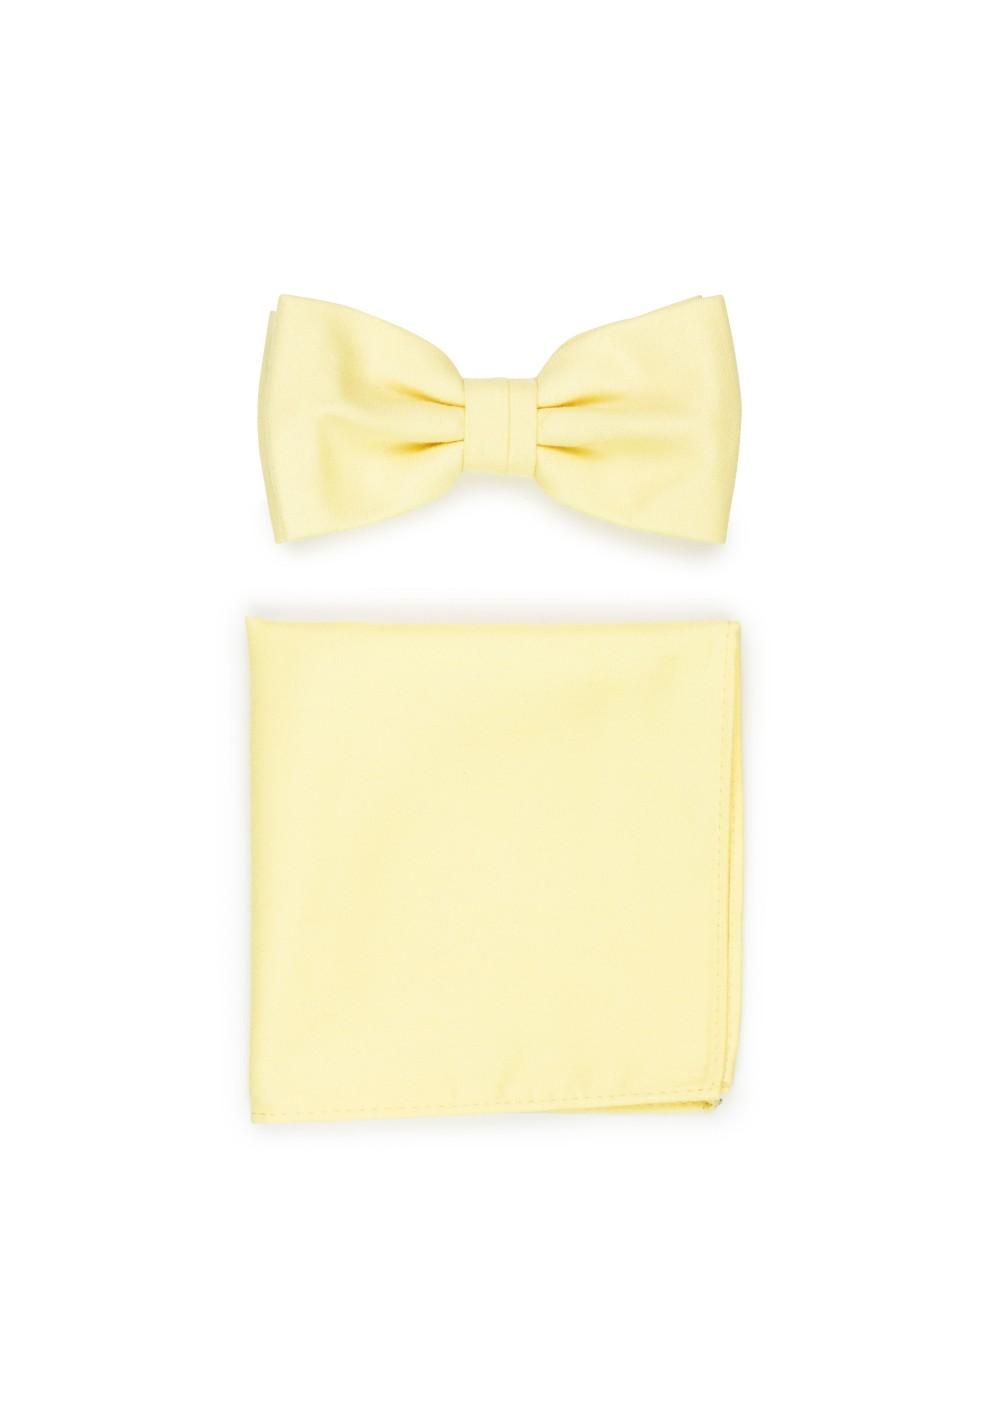 Summer Bowtie Set in Lemon Chiffon